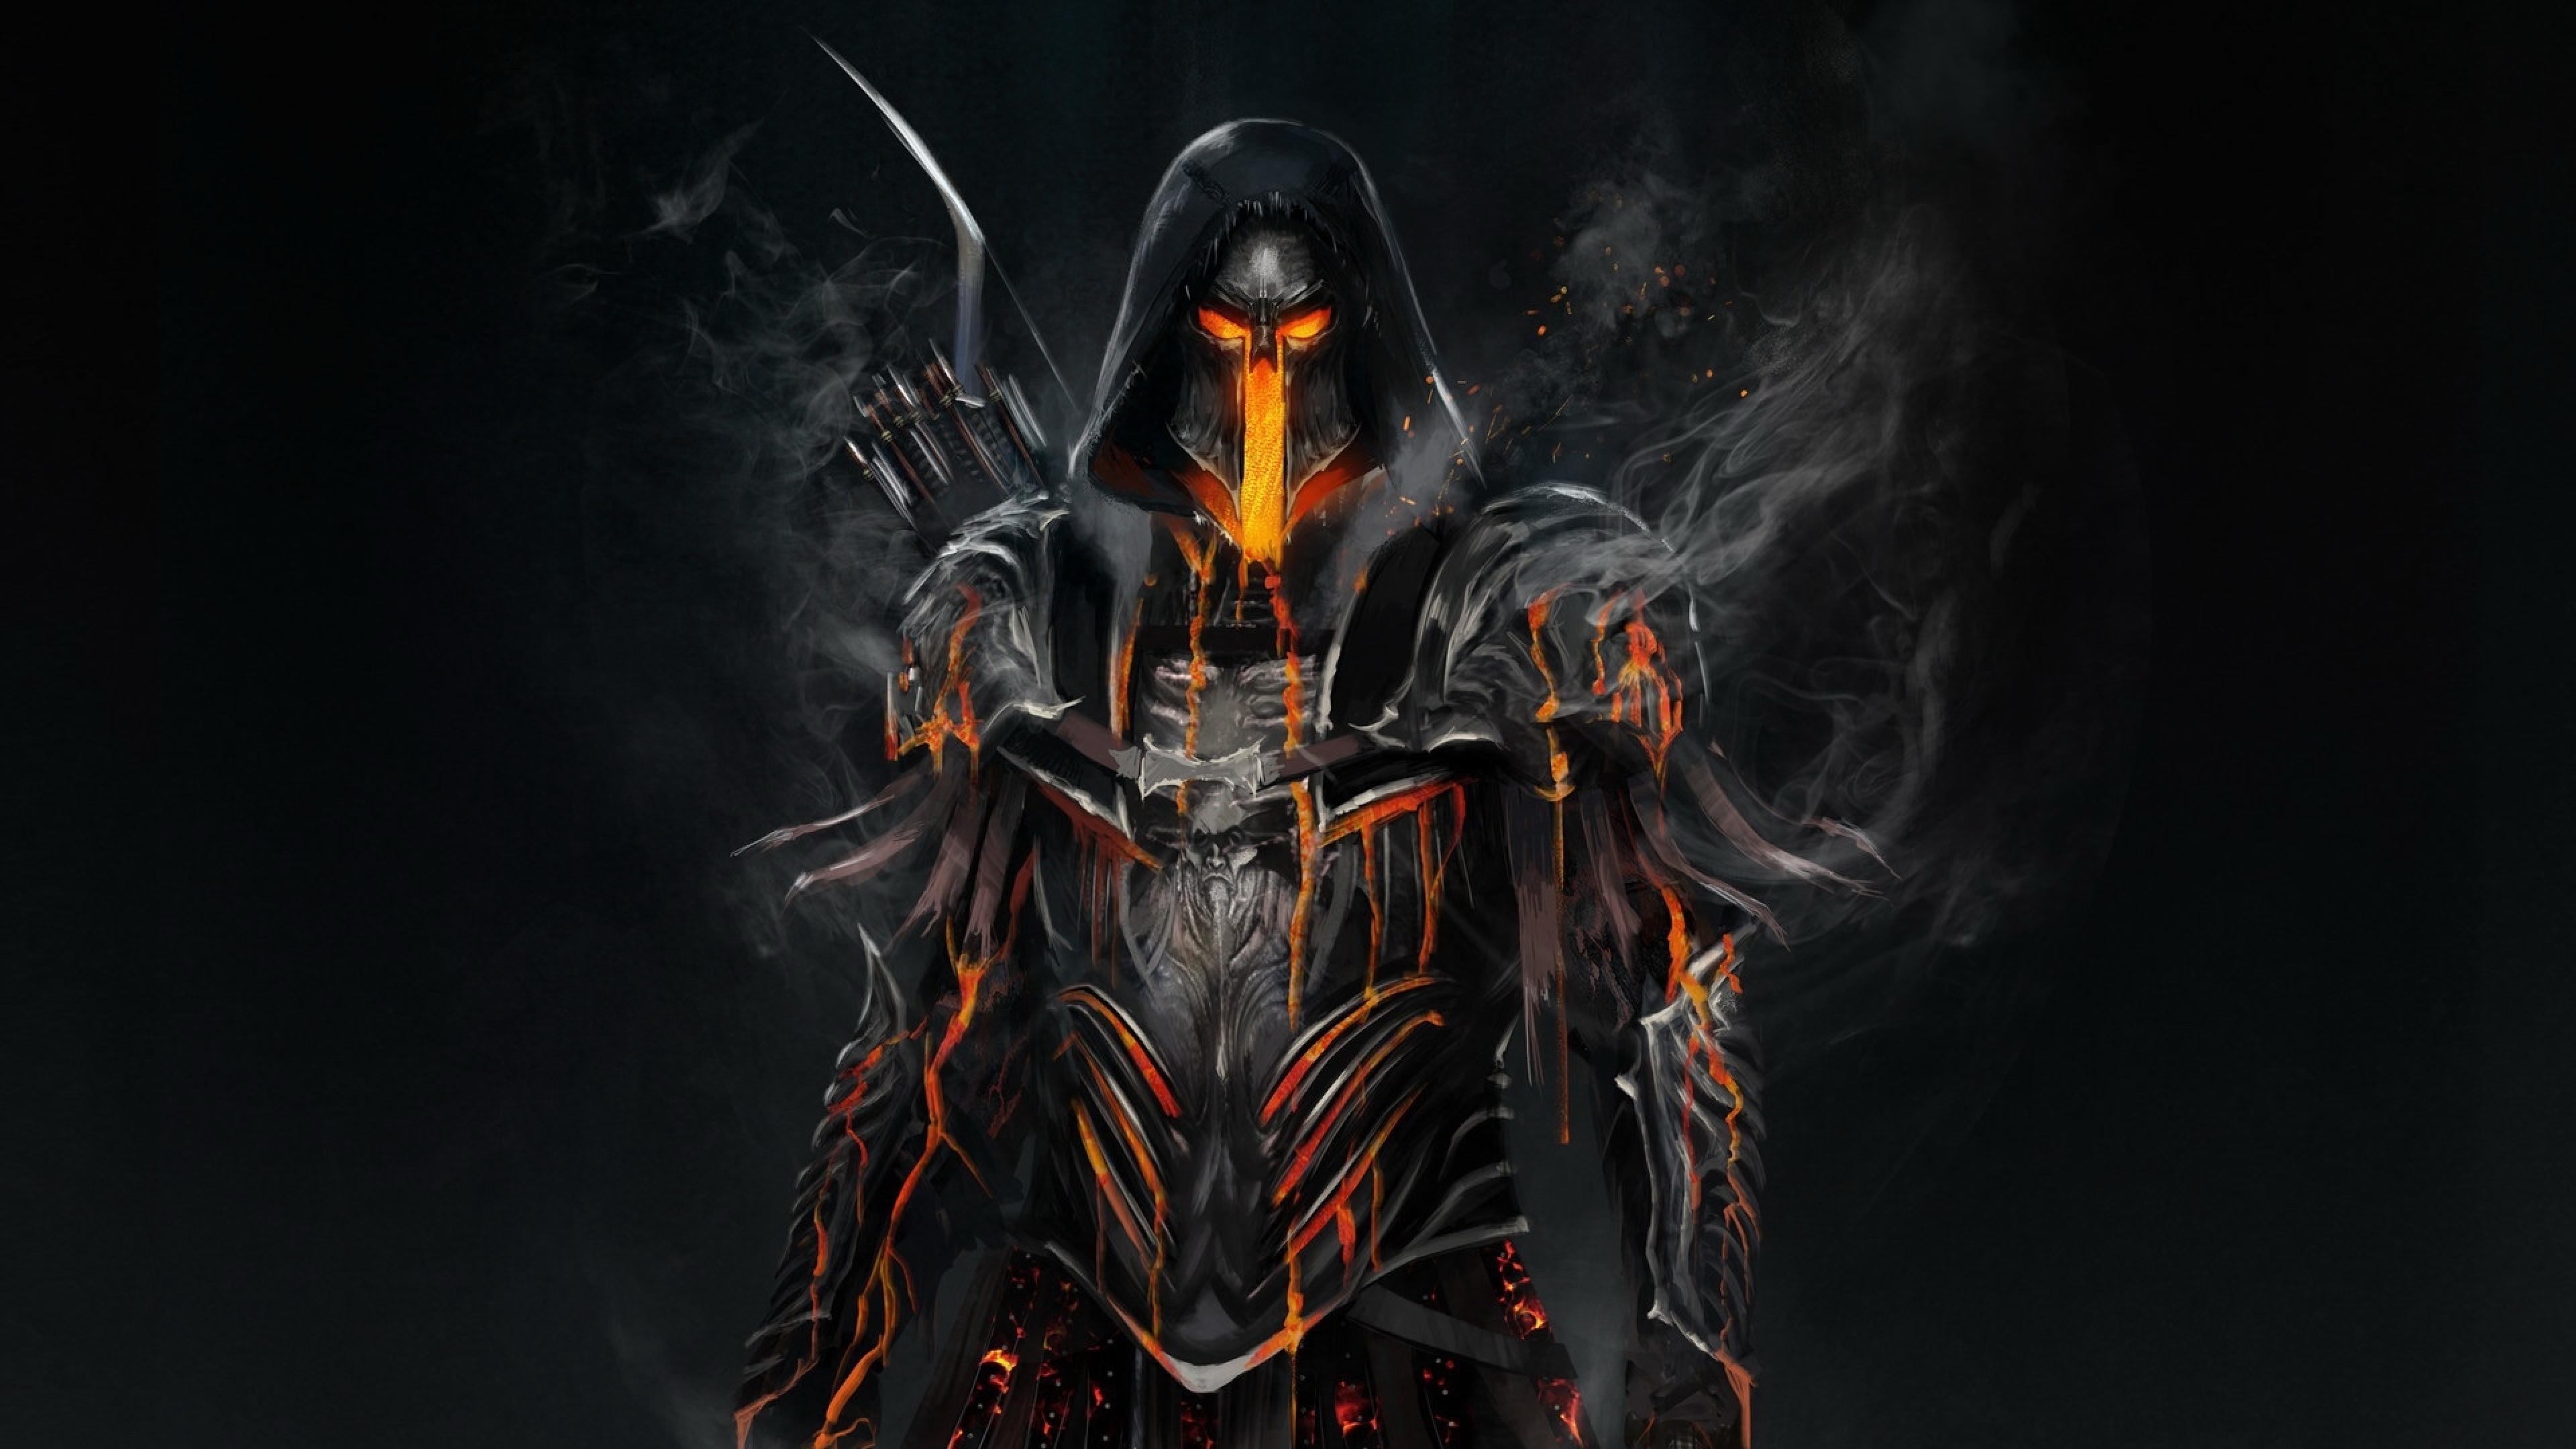 3840x2160 Game Assassins Creed Odyssey 4K Wallpaper, HD ...